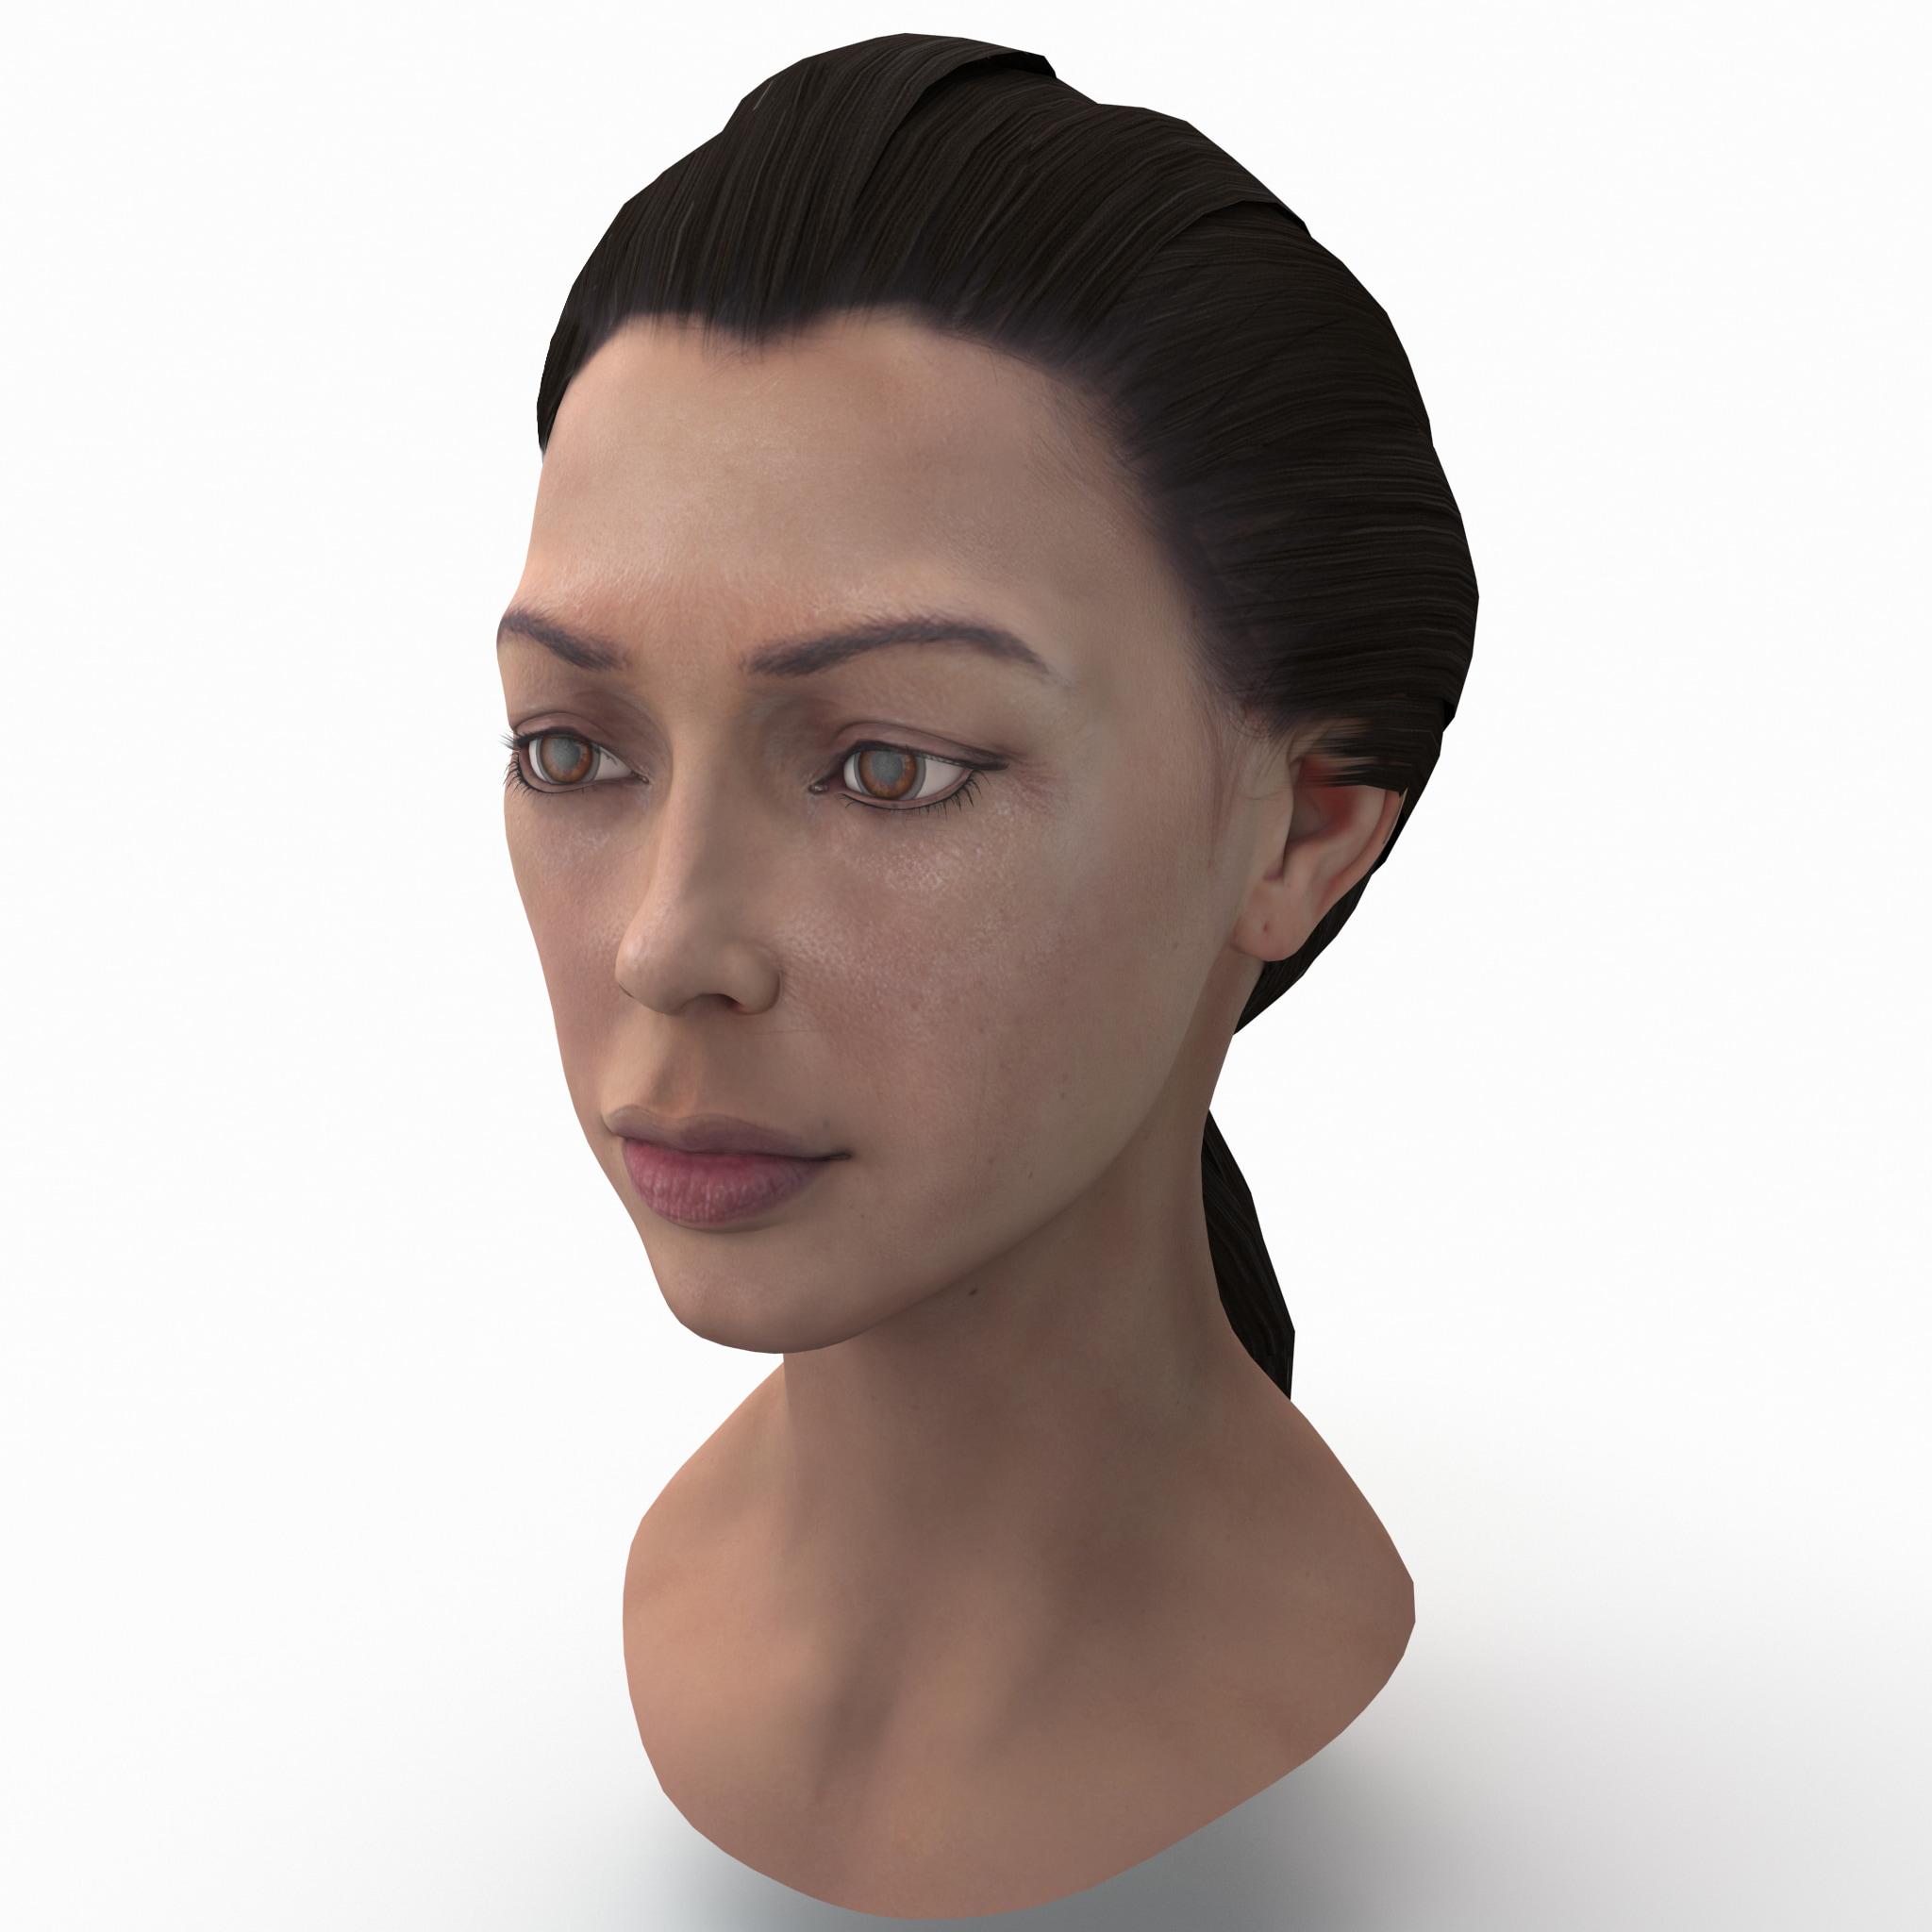 female head 3 3d model